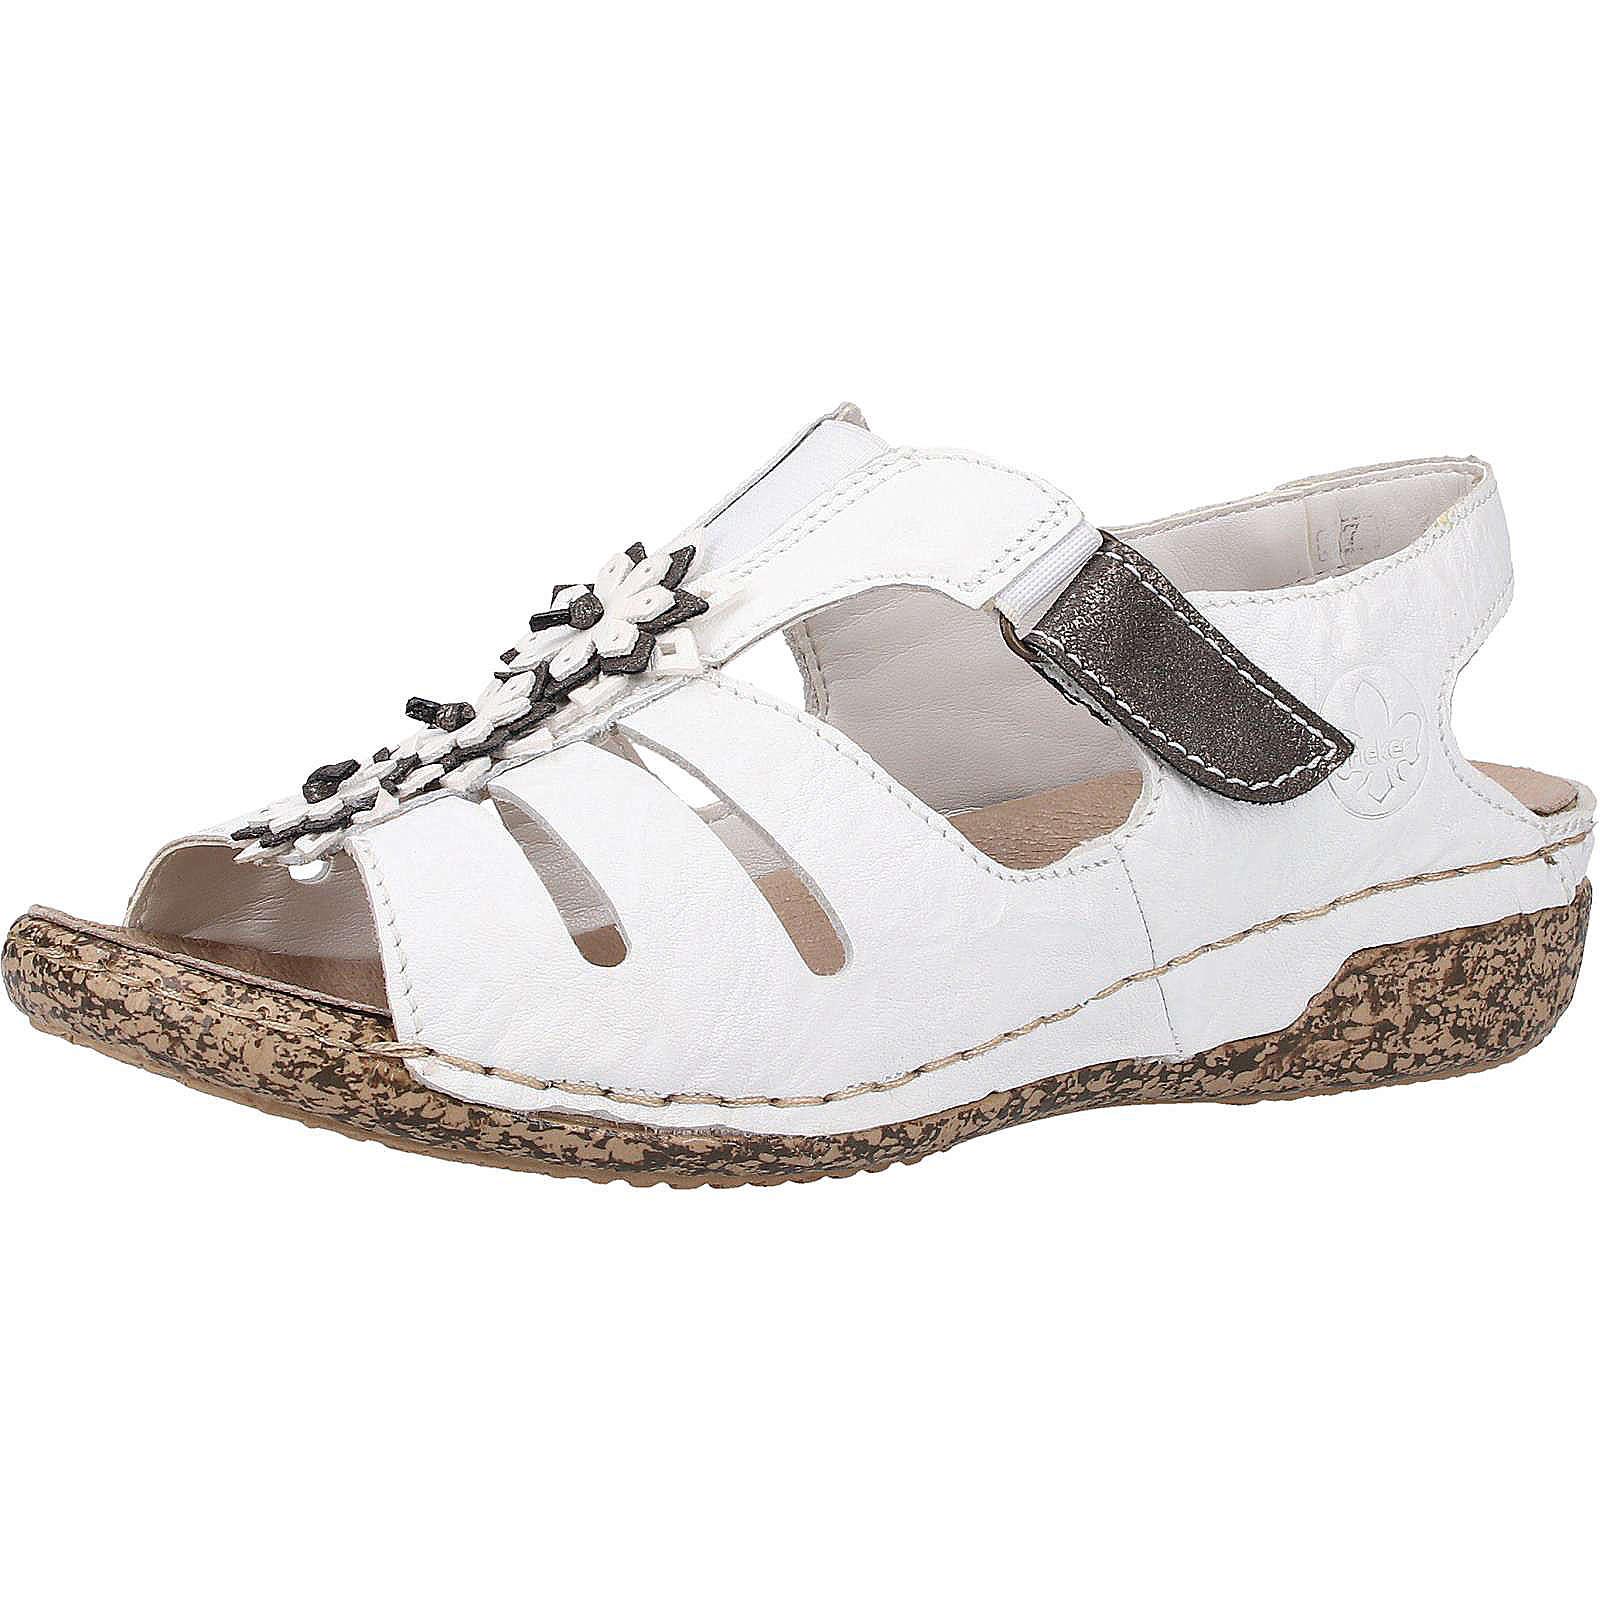 rieker Sandalen Klassische Sandaletten weiß Damen Gr. 37